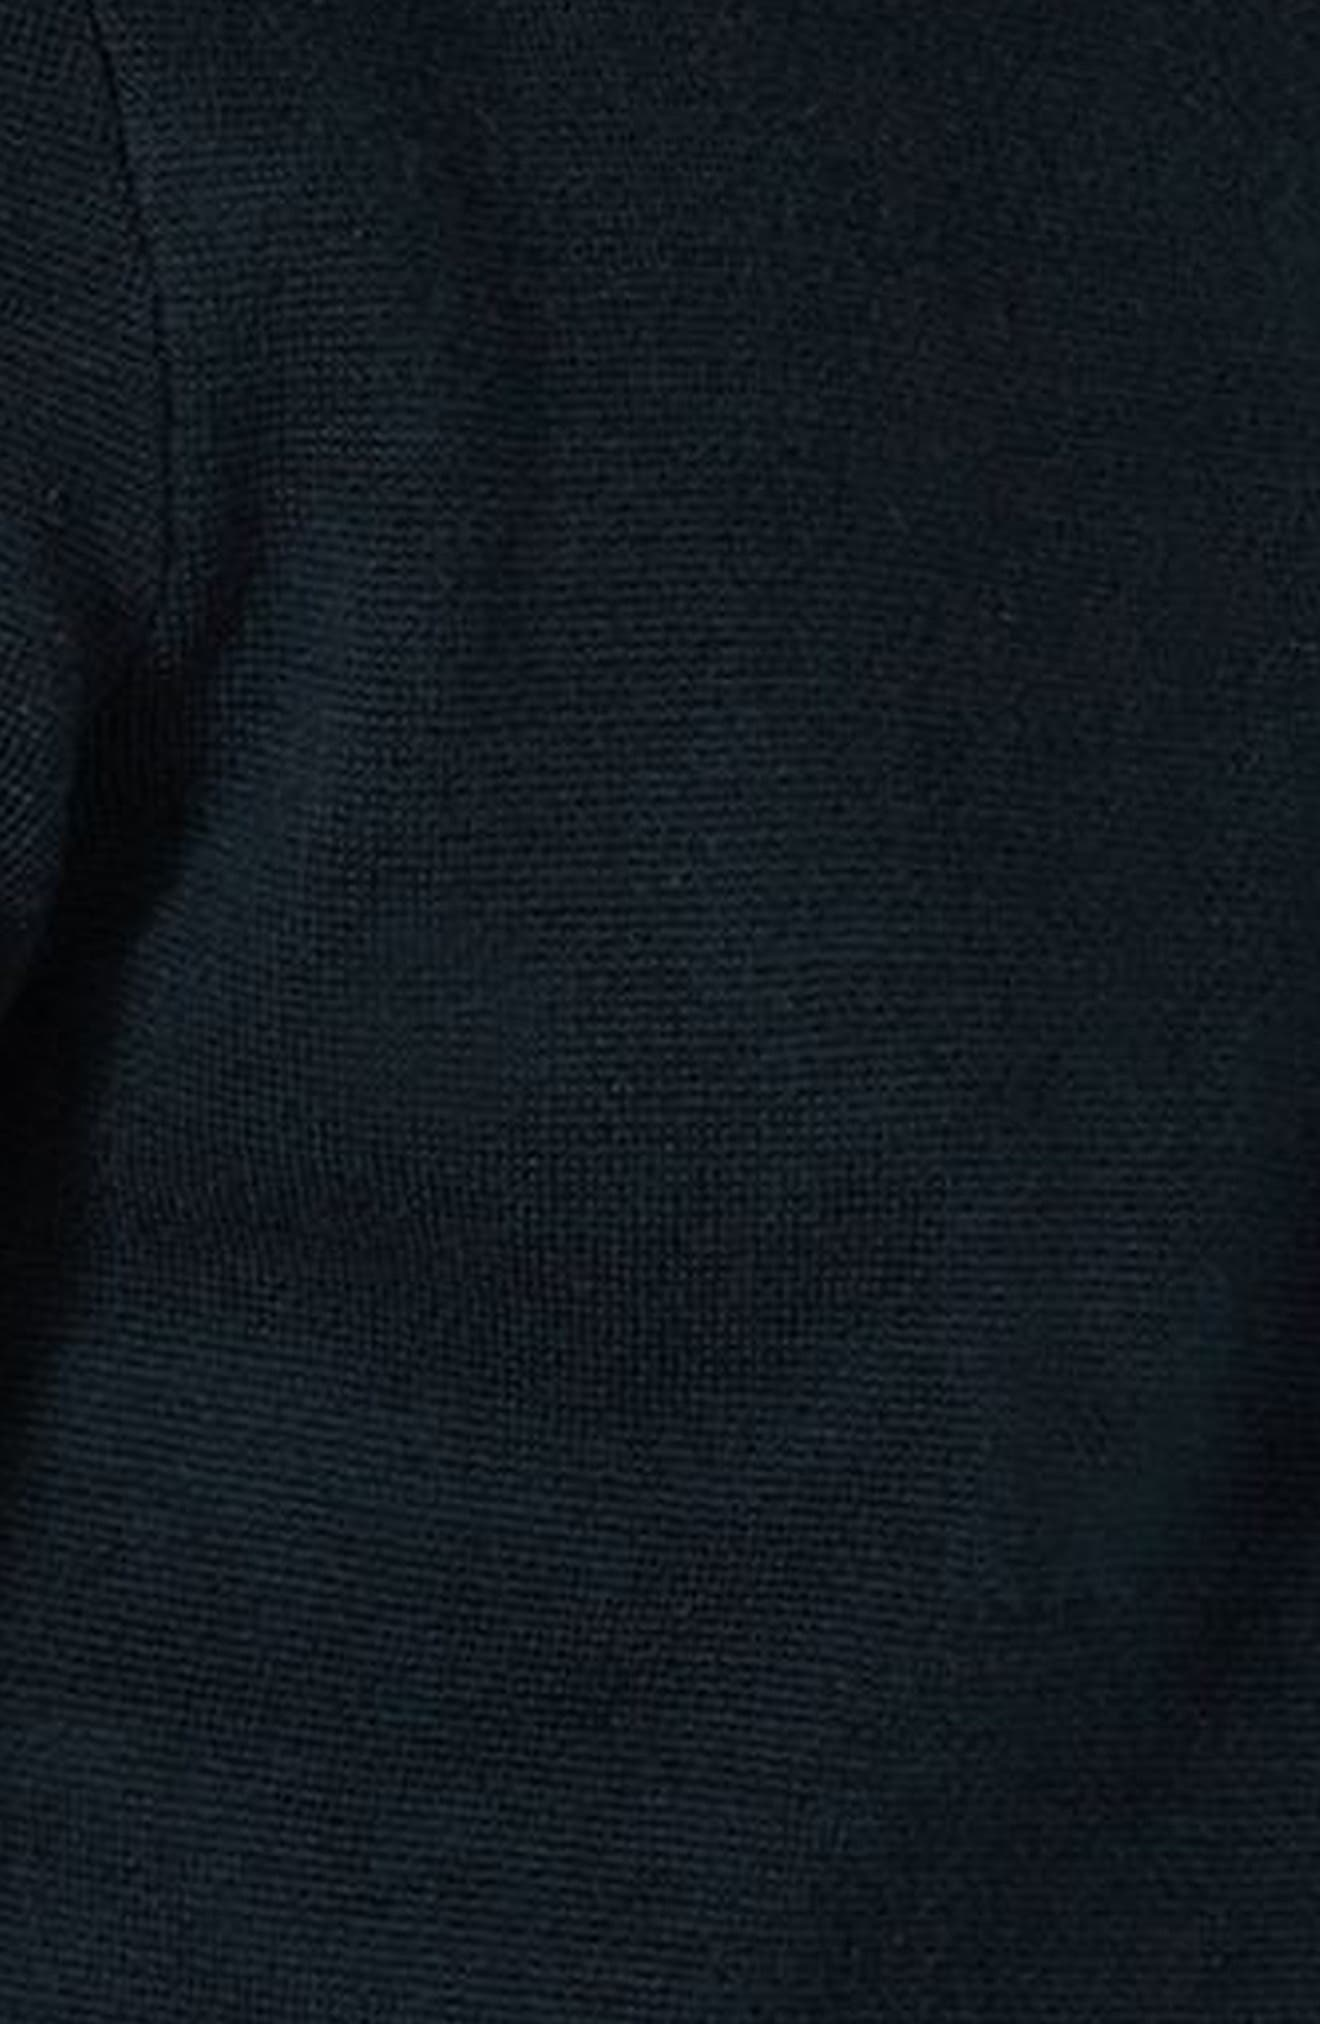 TOPMAN,                             Stripe Knit Zip Front Harrington Sweatshirt,                             Alternate thumbnail 3, color,                             410